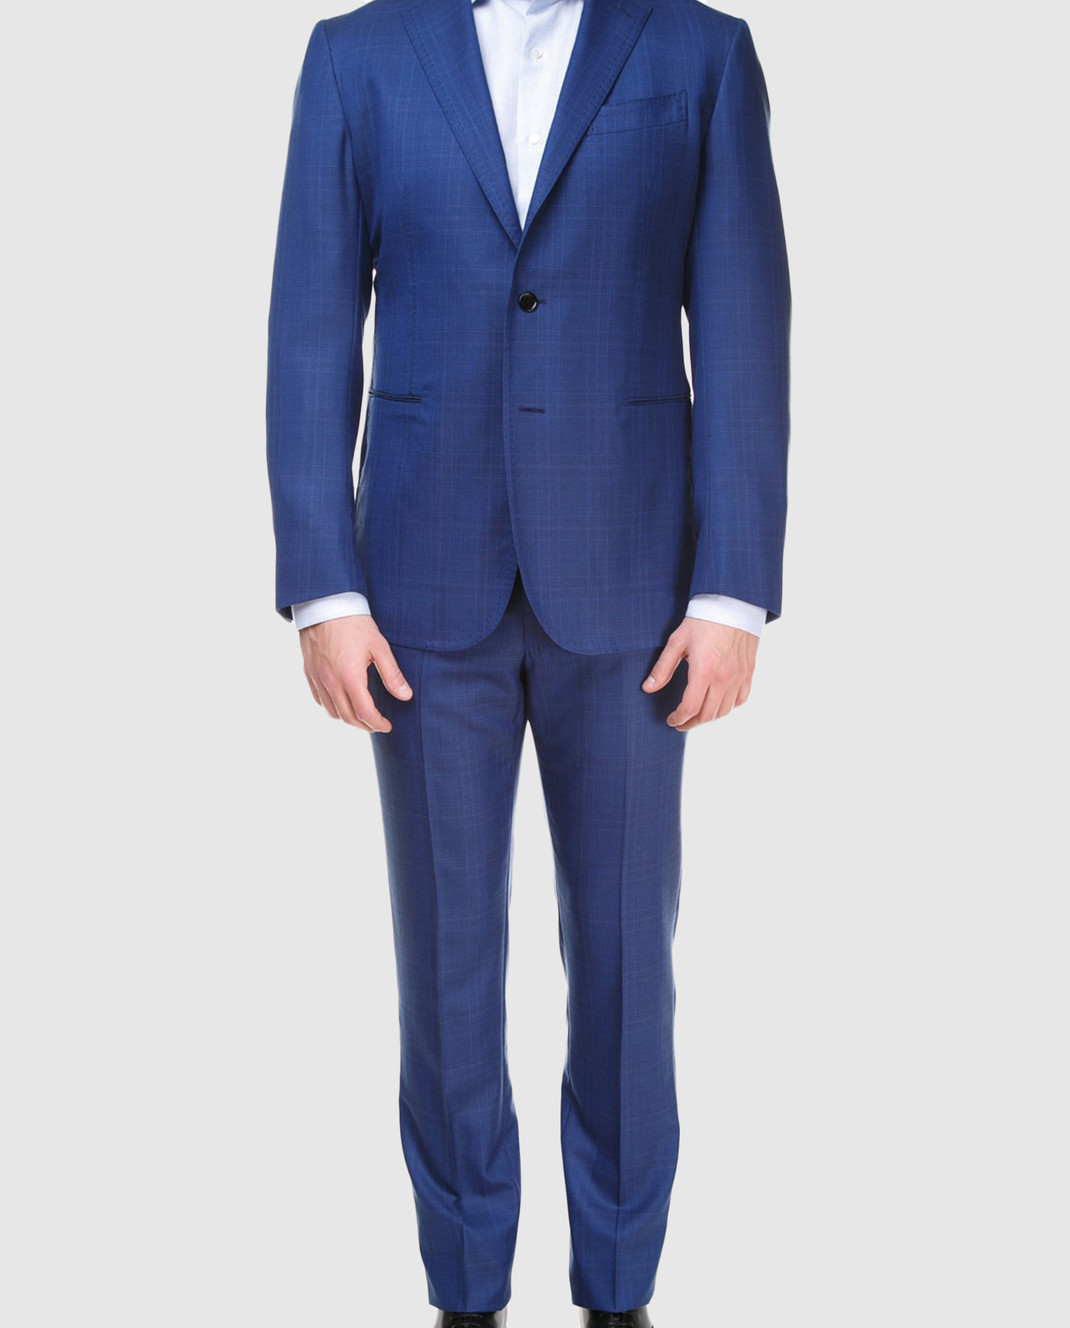 Stile Latino Синий костюм из шерсти AULUCA20A21SWA14 изображение 4